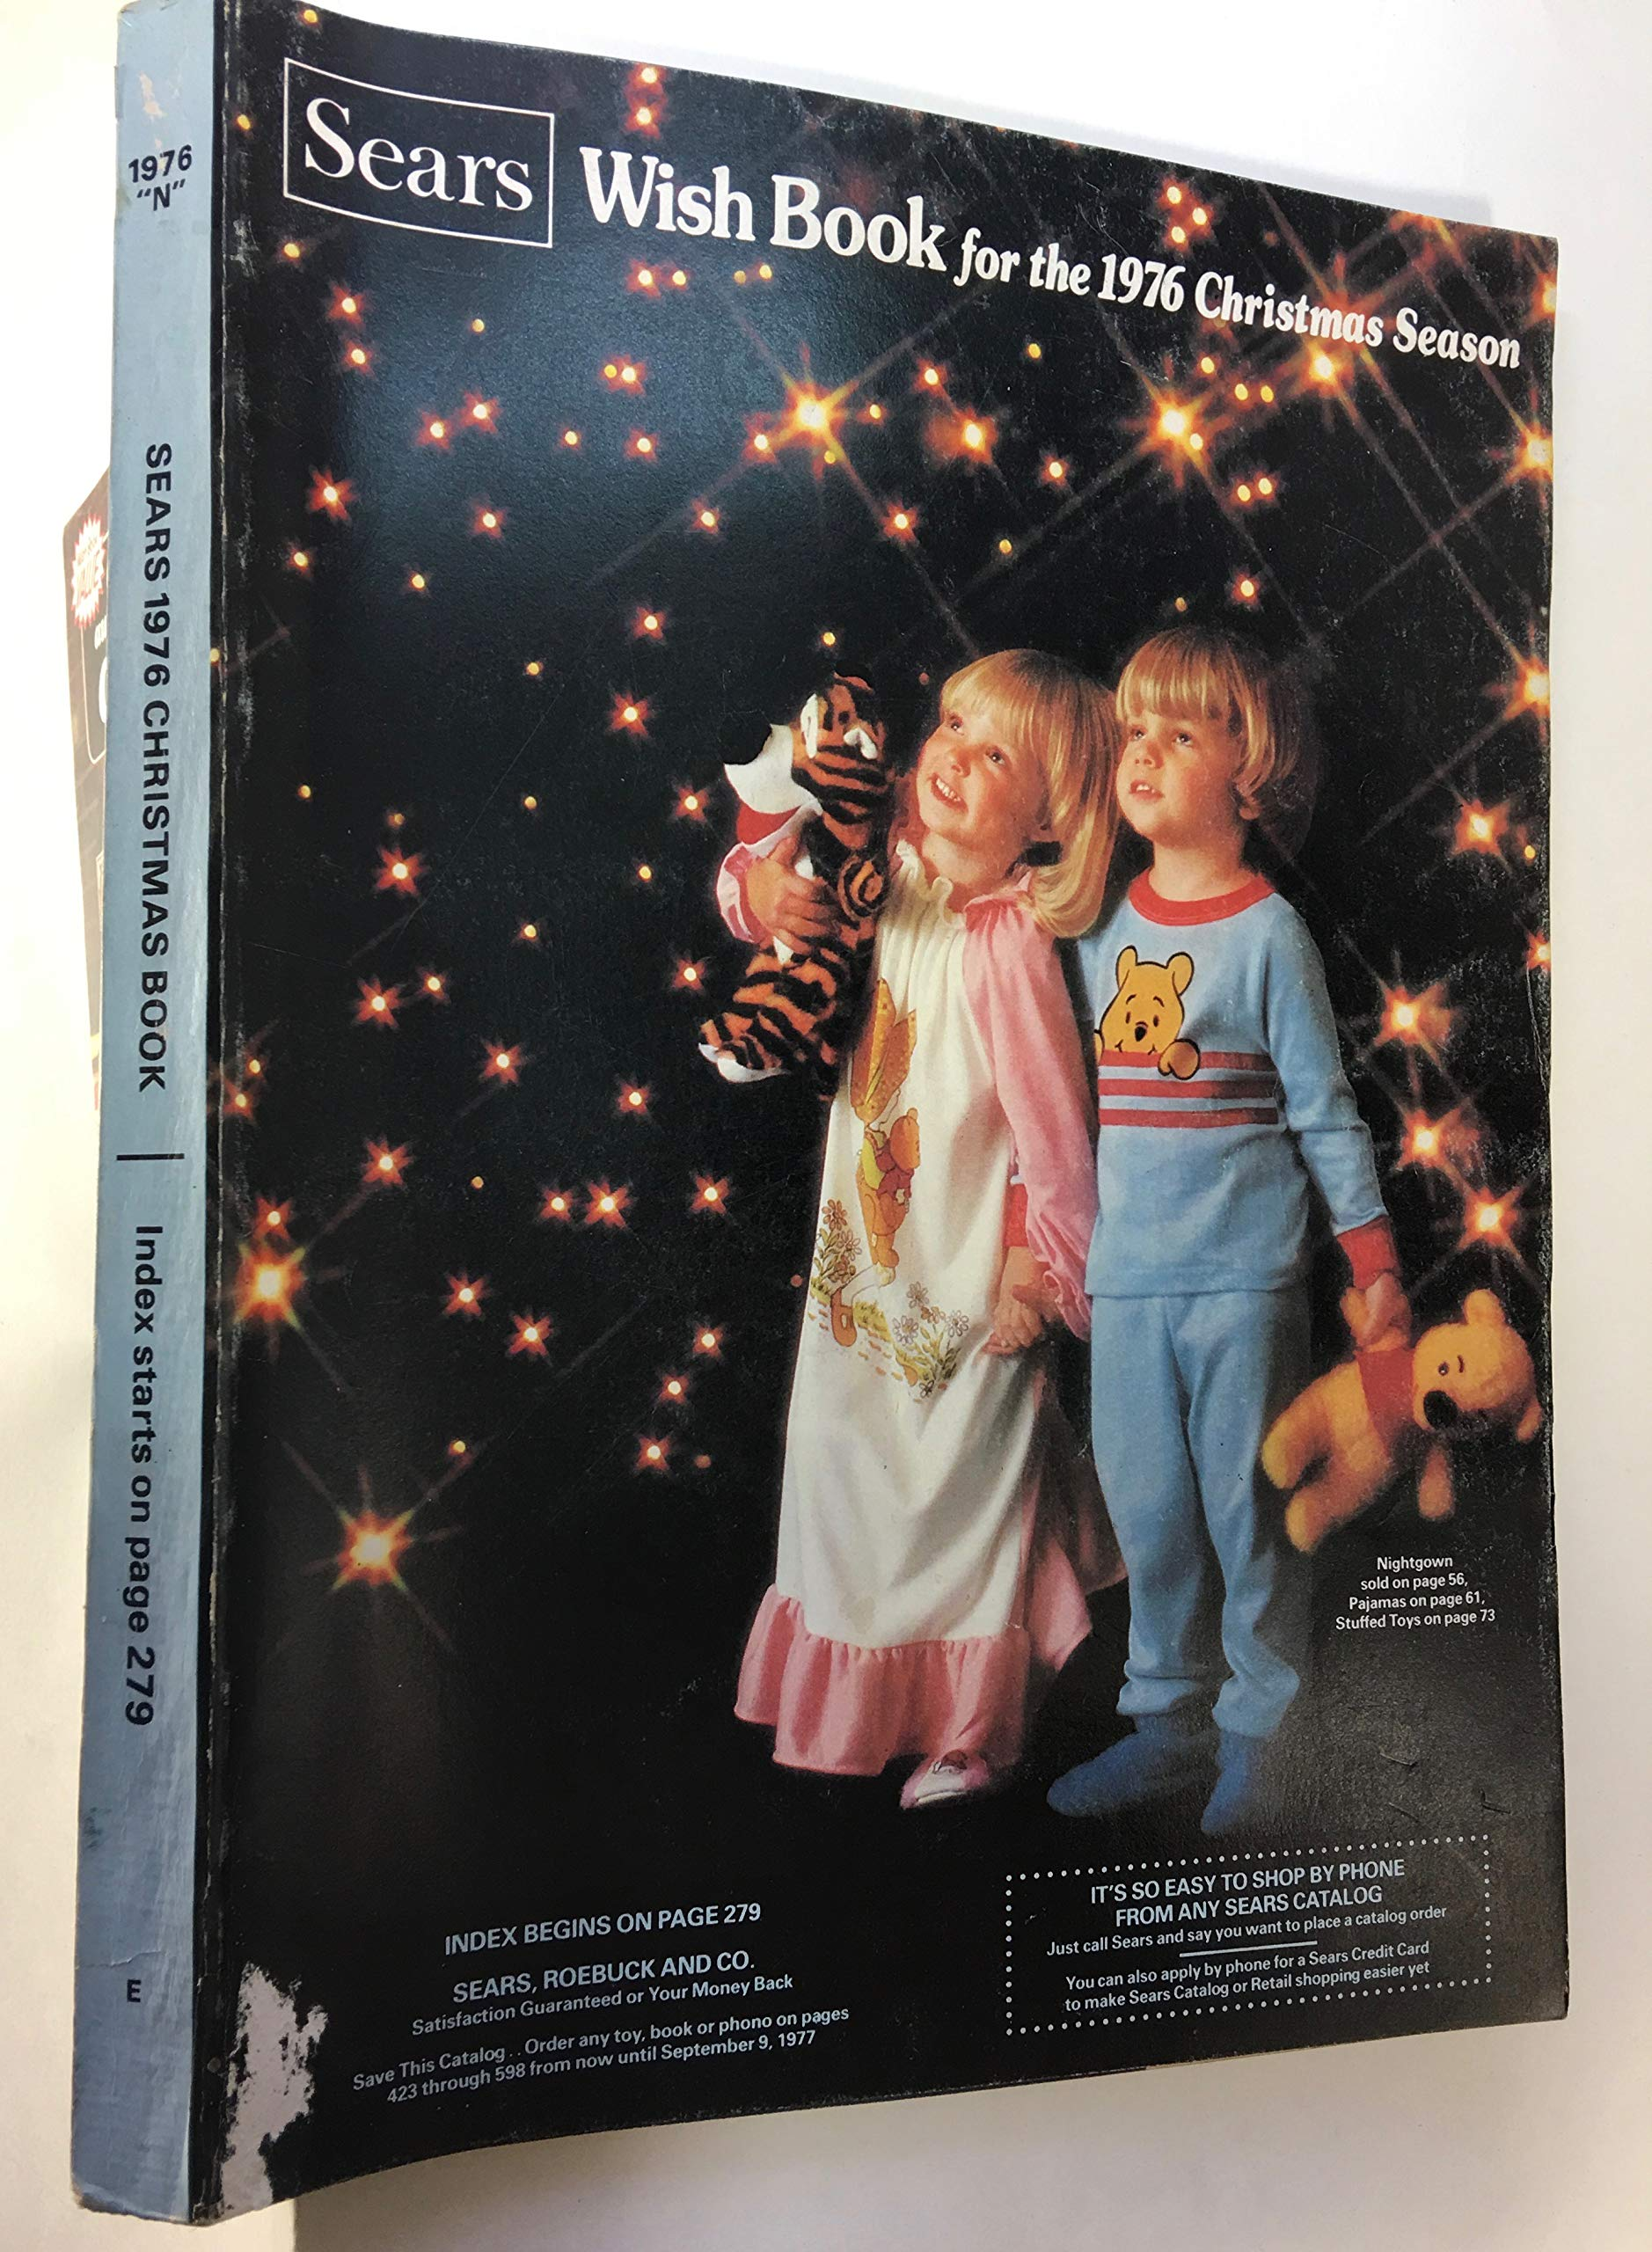 Sears Christmas Wish Book.Sears Wish Book 1976 Christmas Season Amazon Com Books